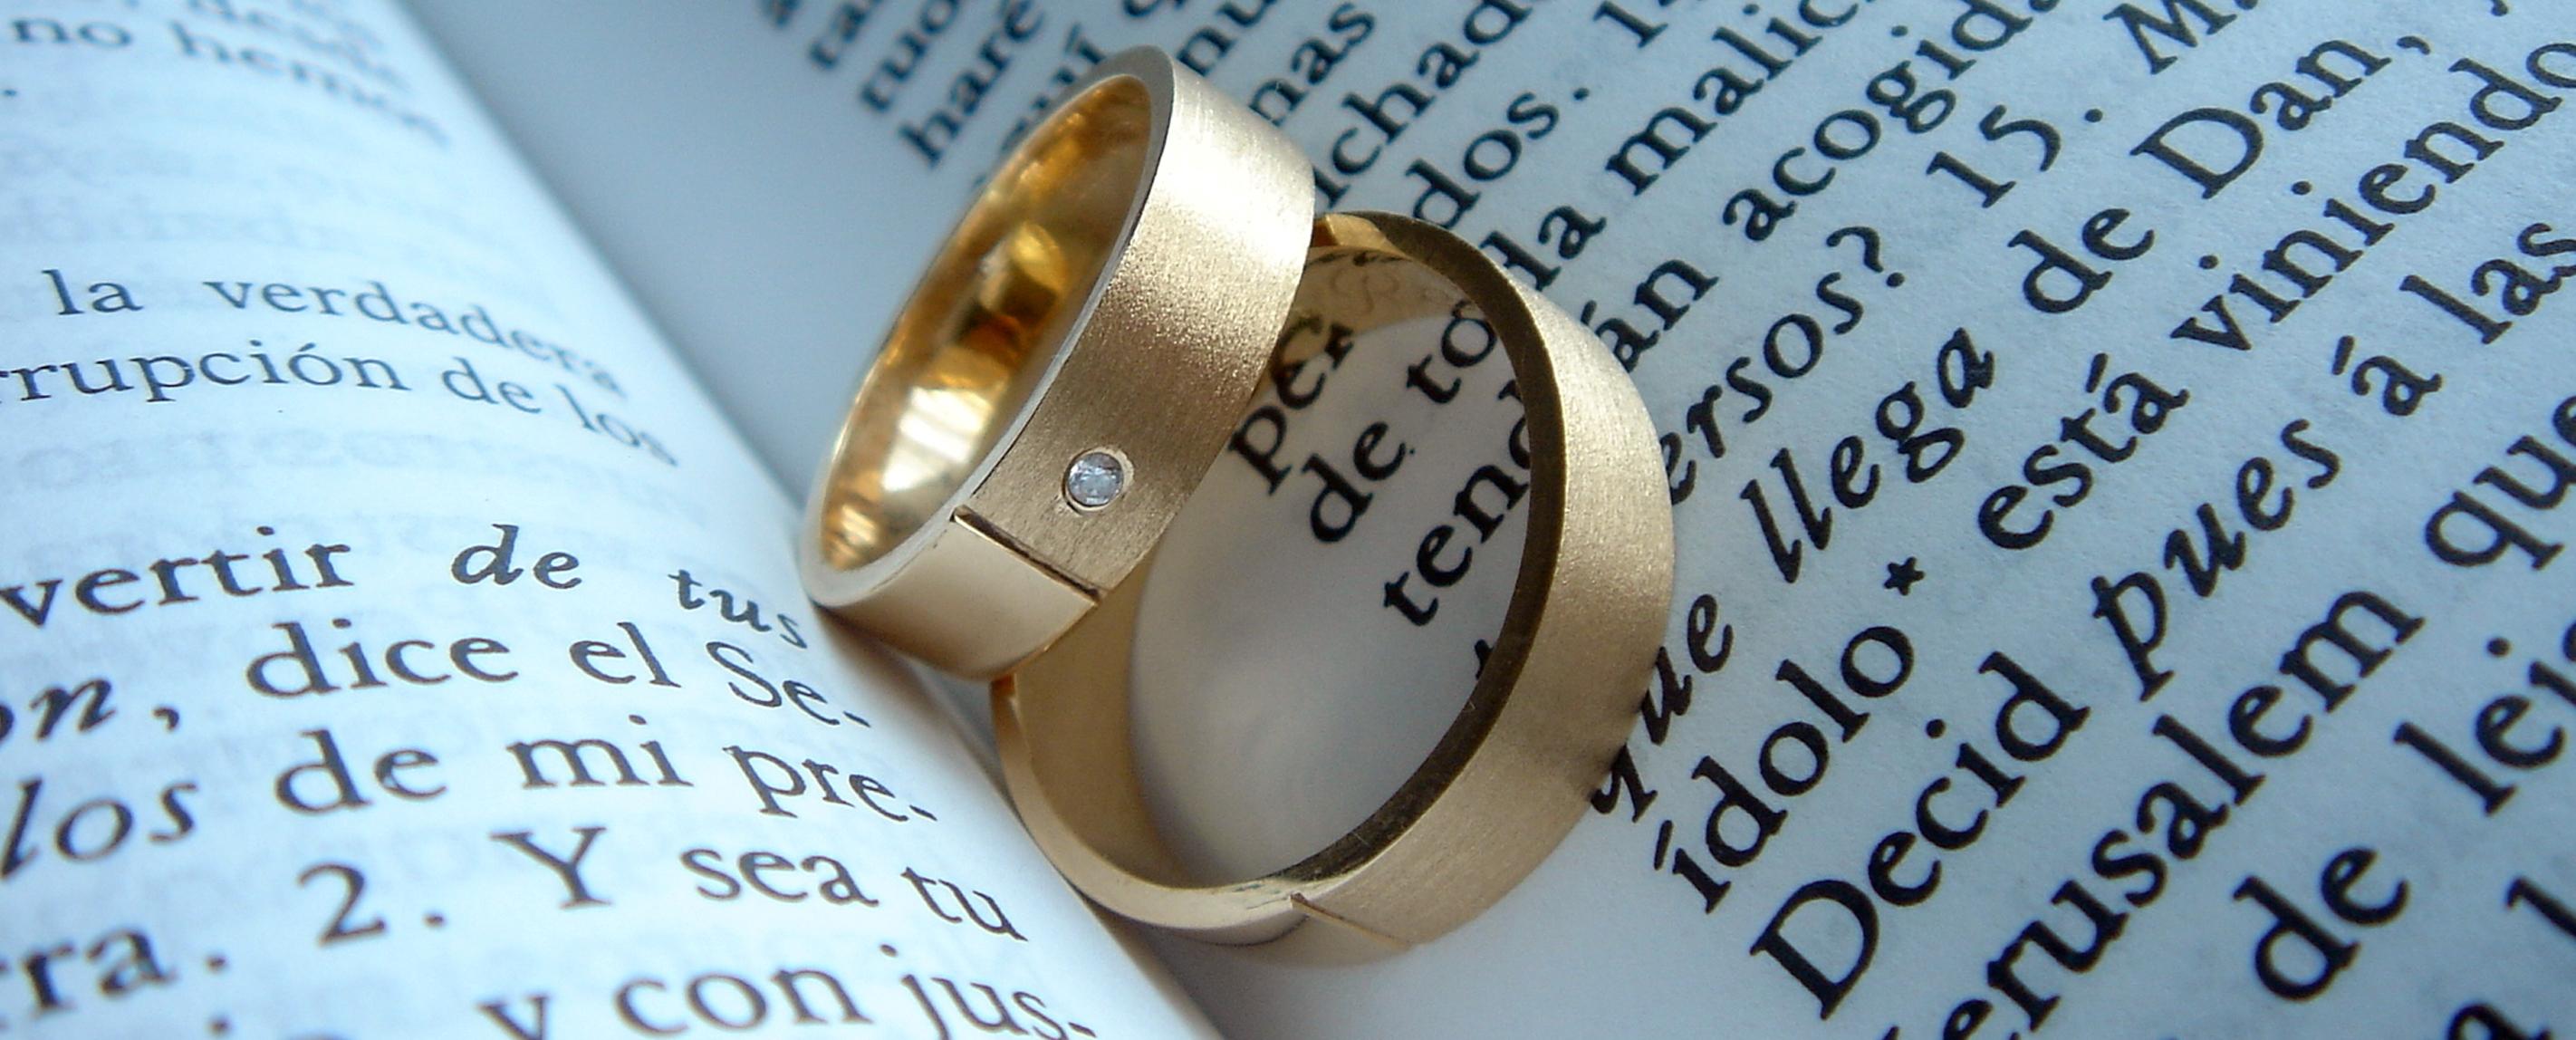 ¿Estas preparado para el matrimonio?